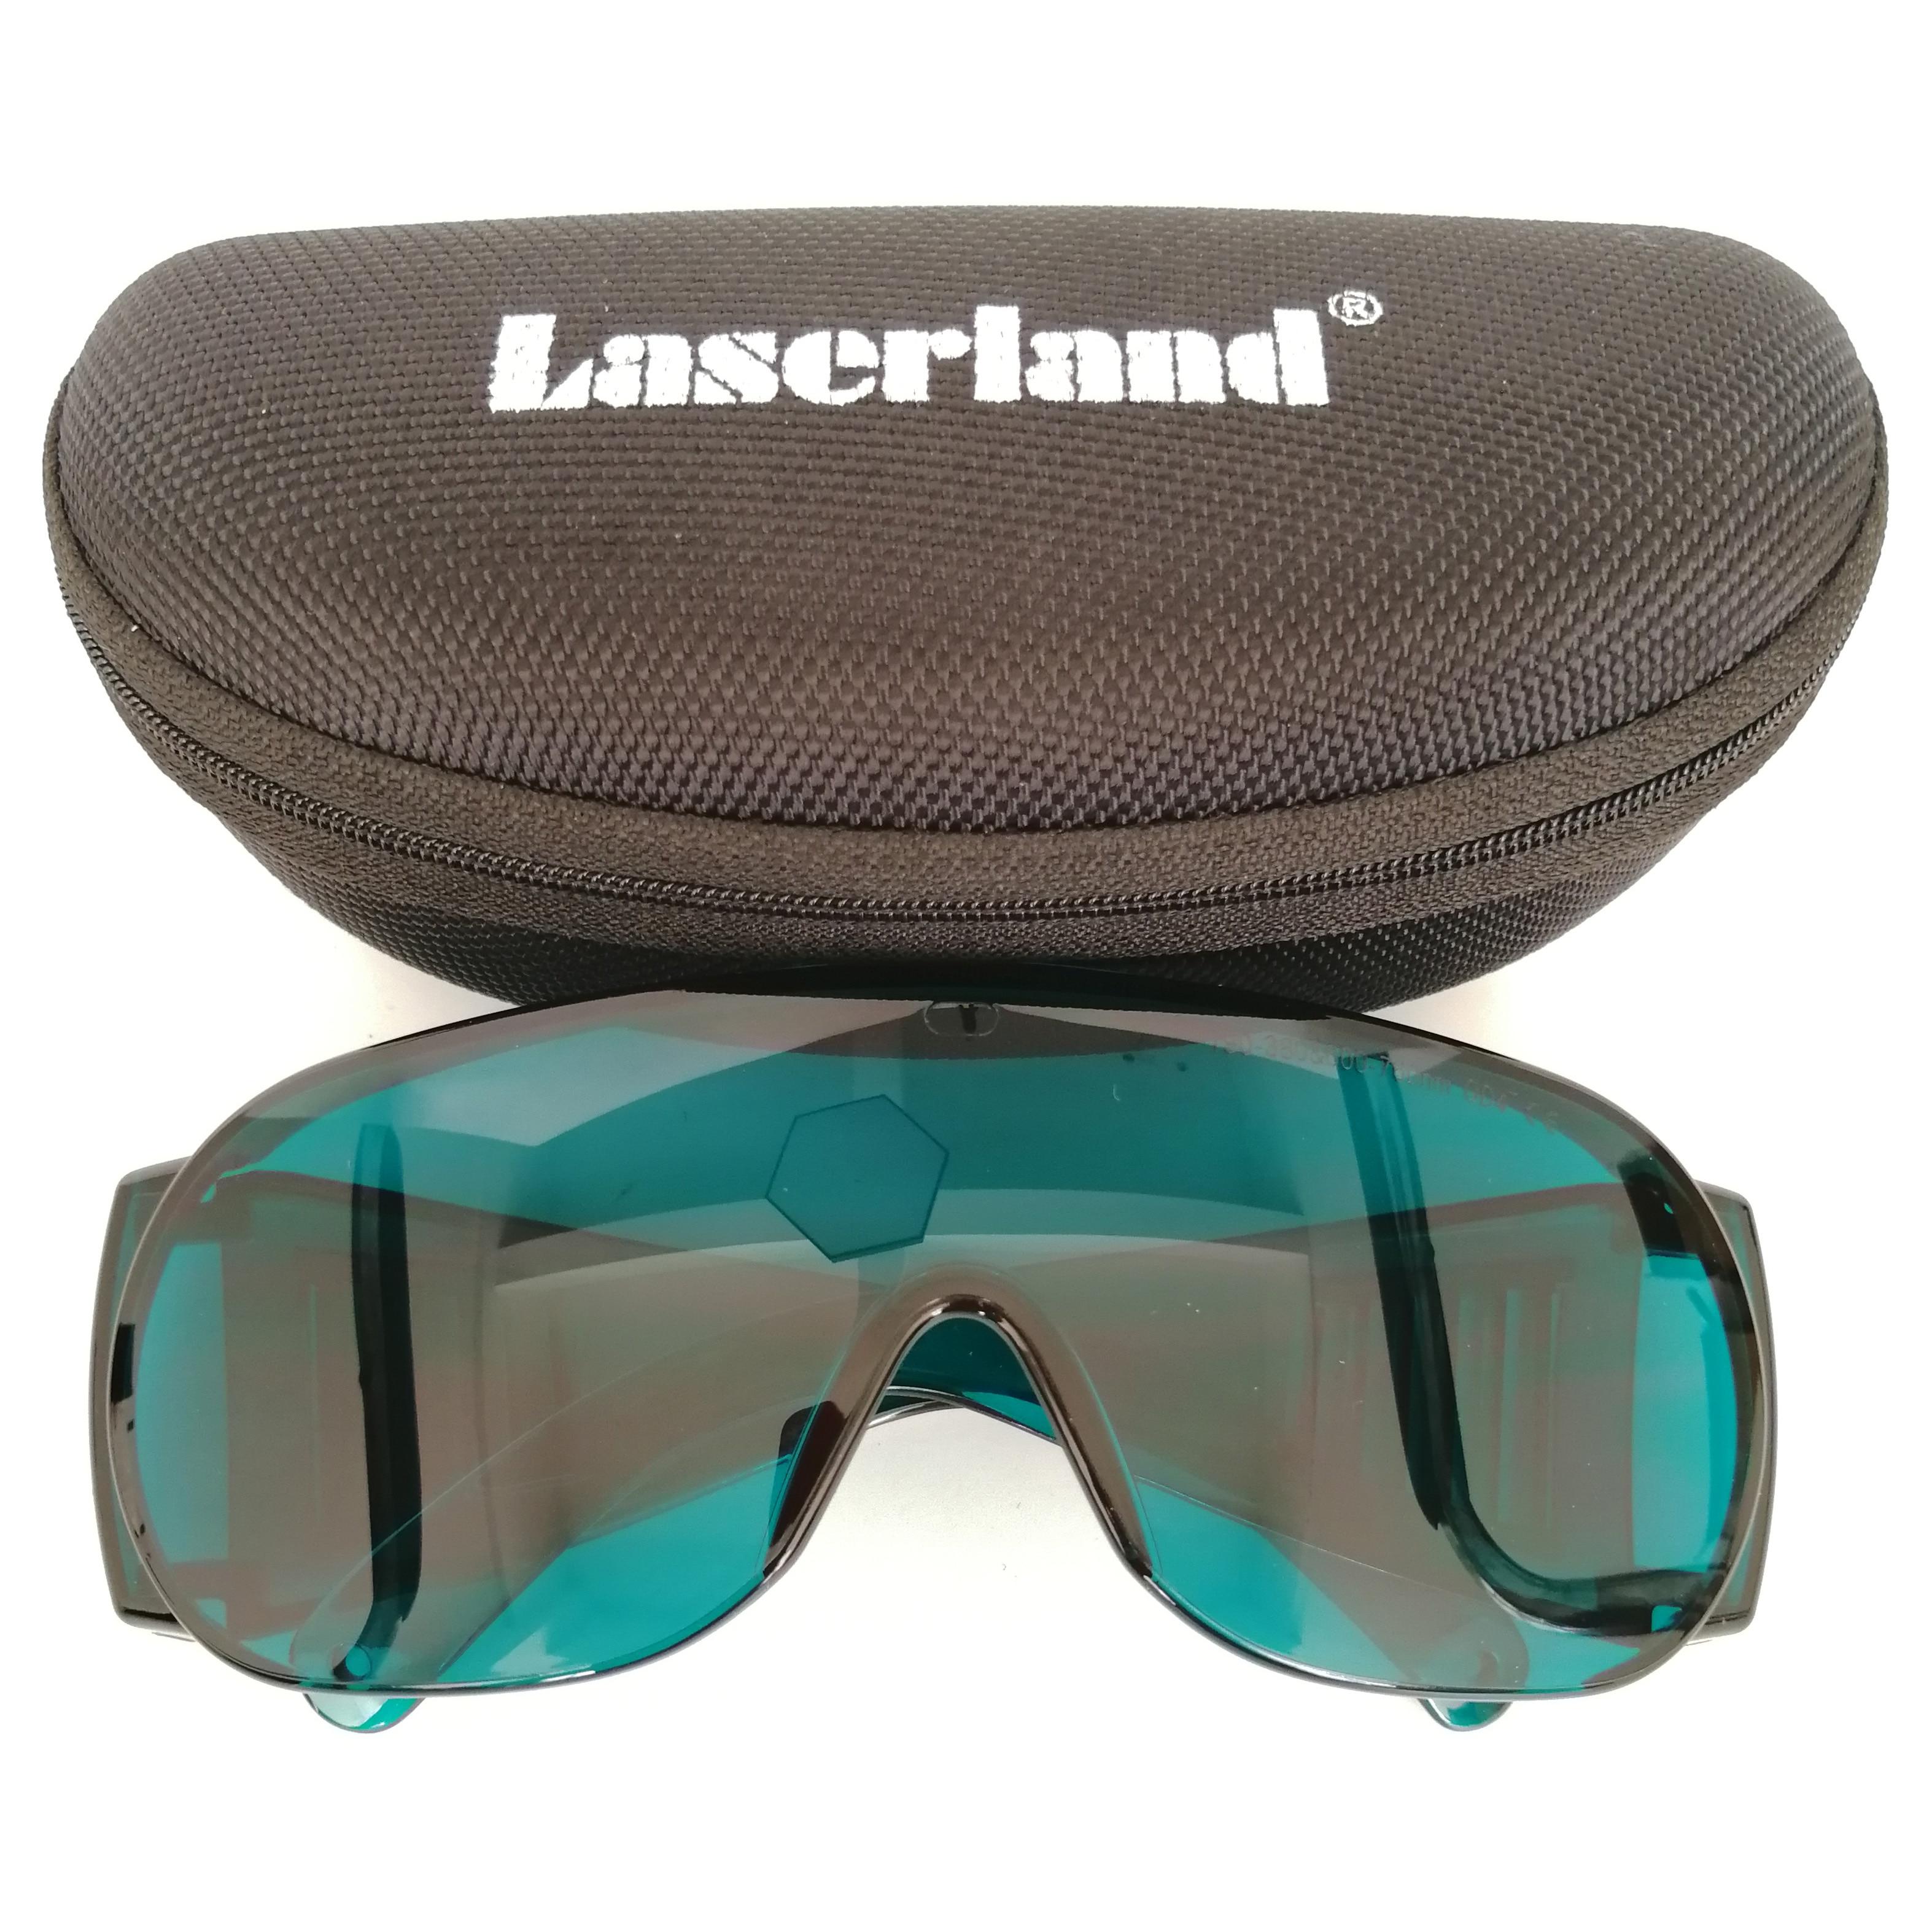 IR Laser Protective Goggles Glasses EP-8 190nm-470nm UV 800nm-808nm-1700nm OD5